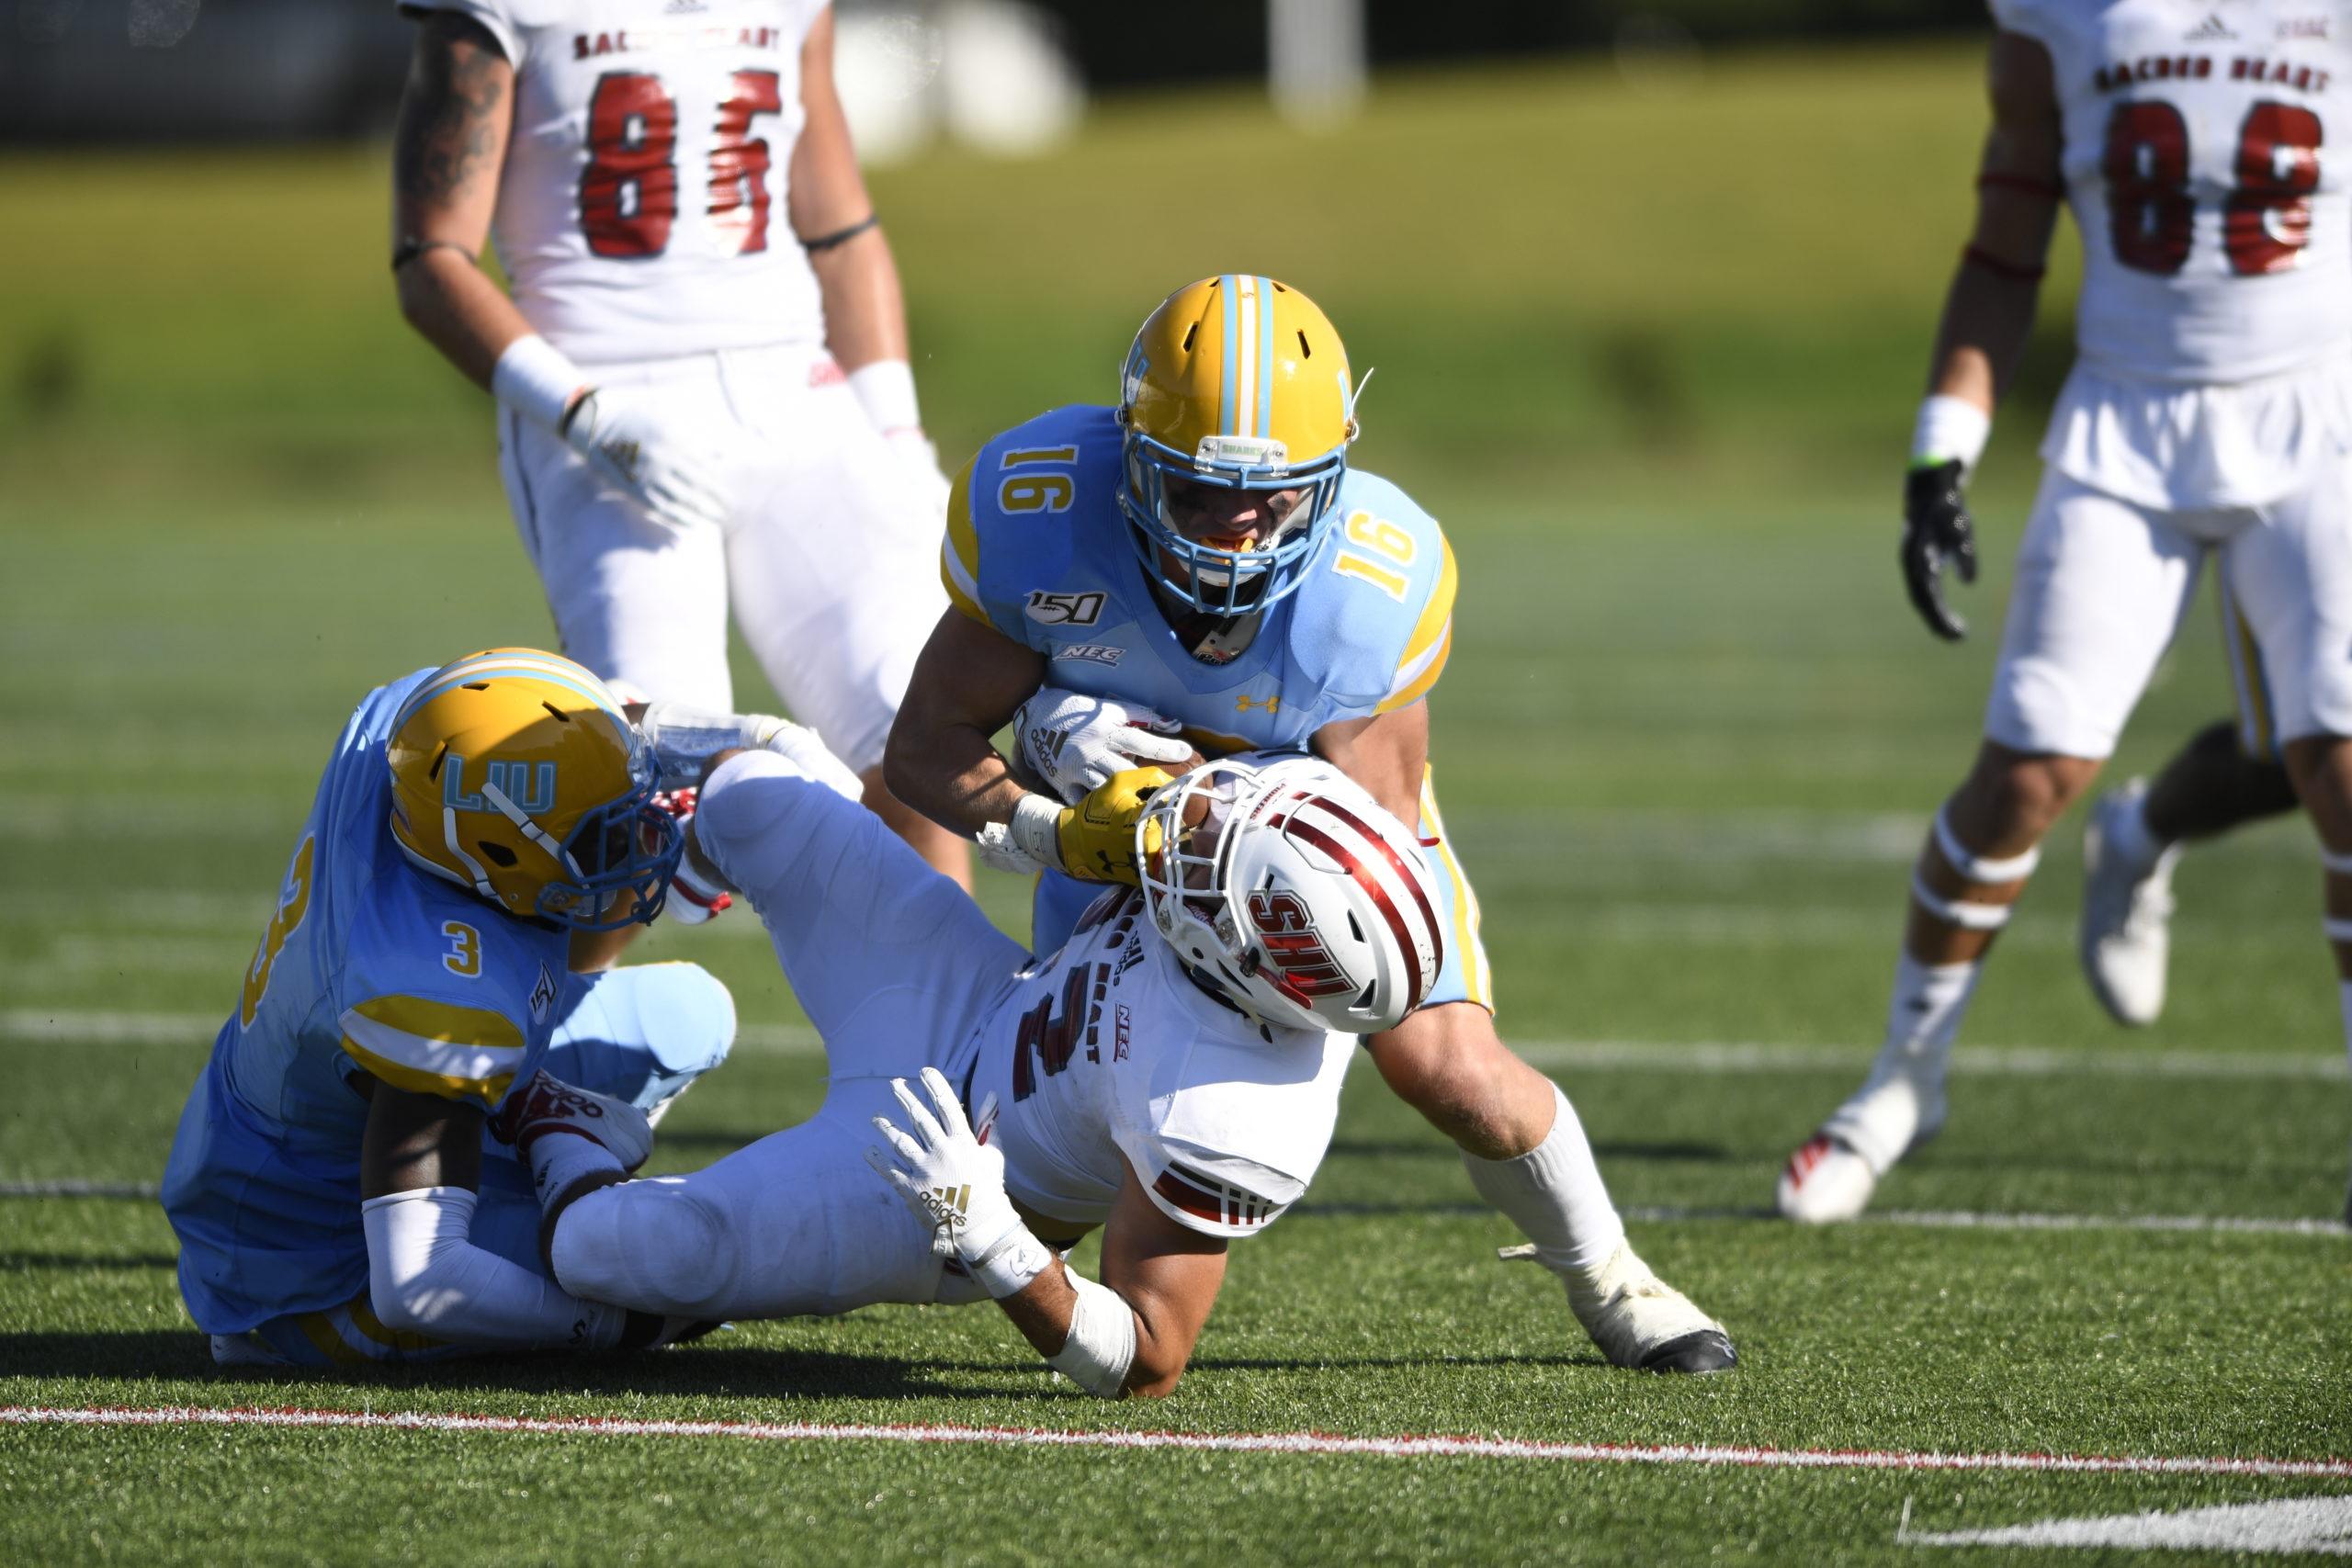 Liam McIntyre enjoyed a solid freshman season at LIU this past fall.